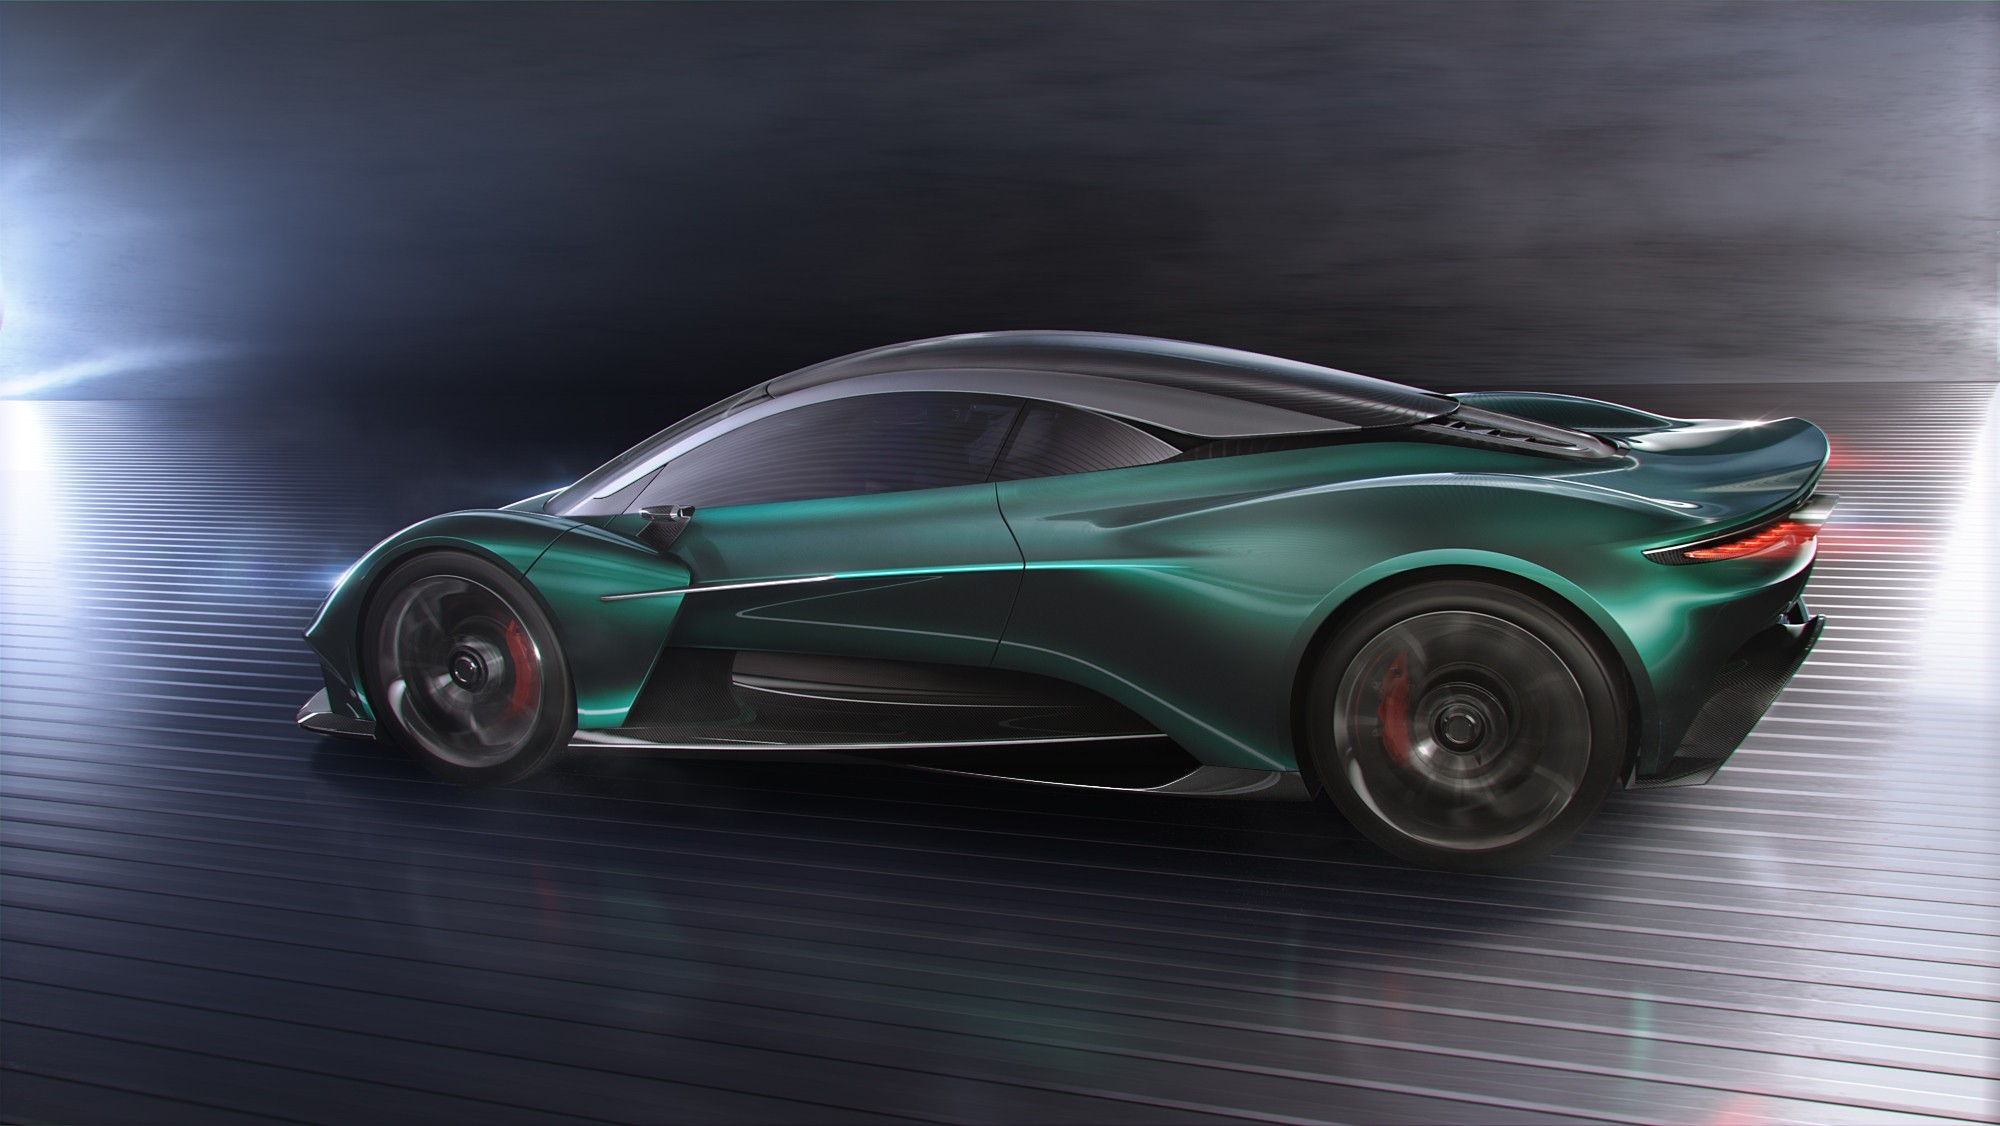 Aston Martin Vanquish Mid Engine Supercar